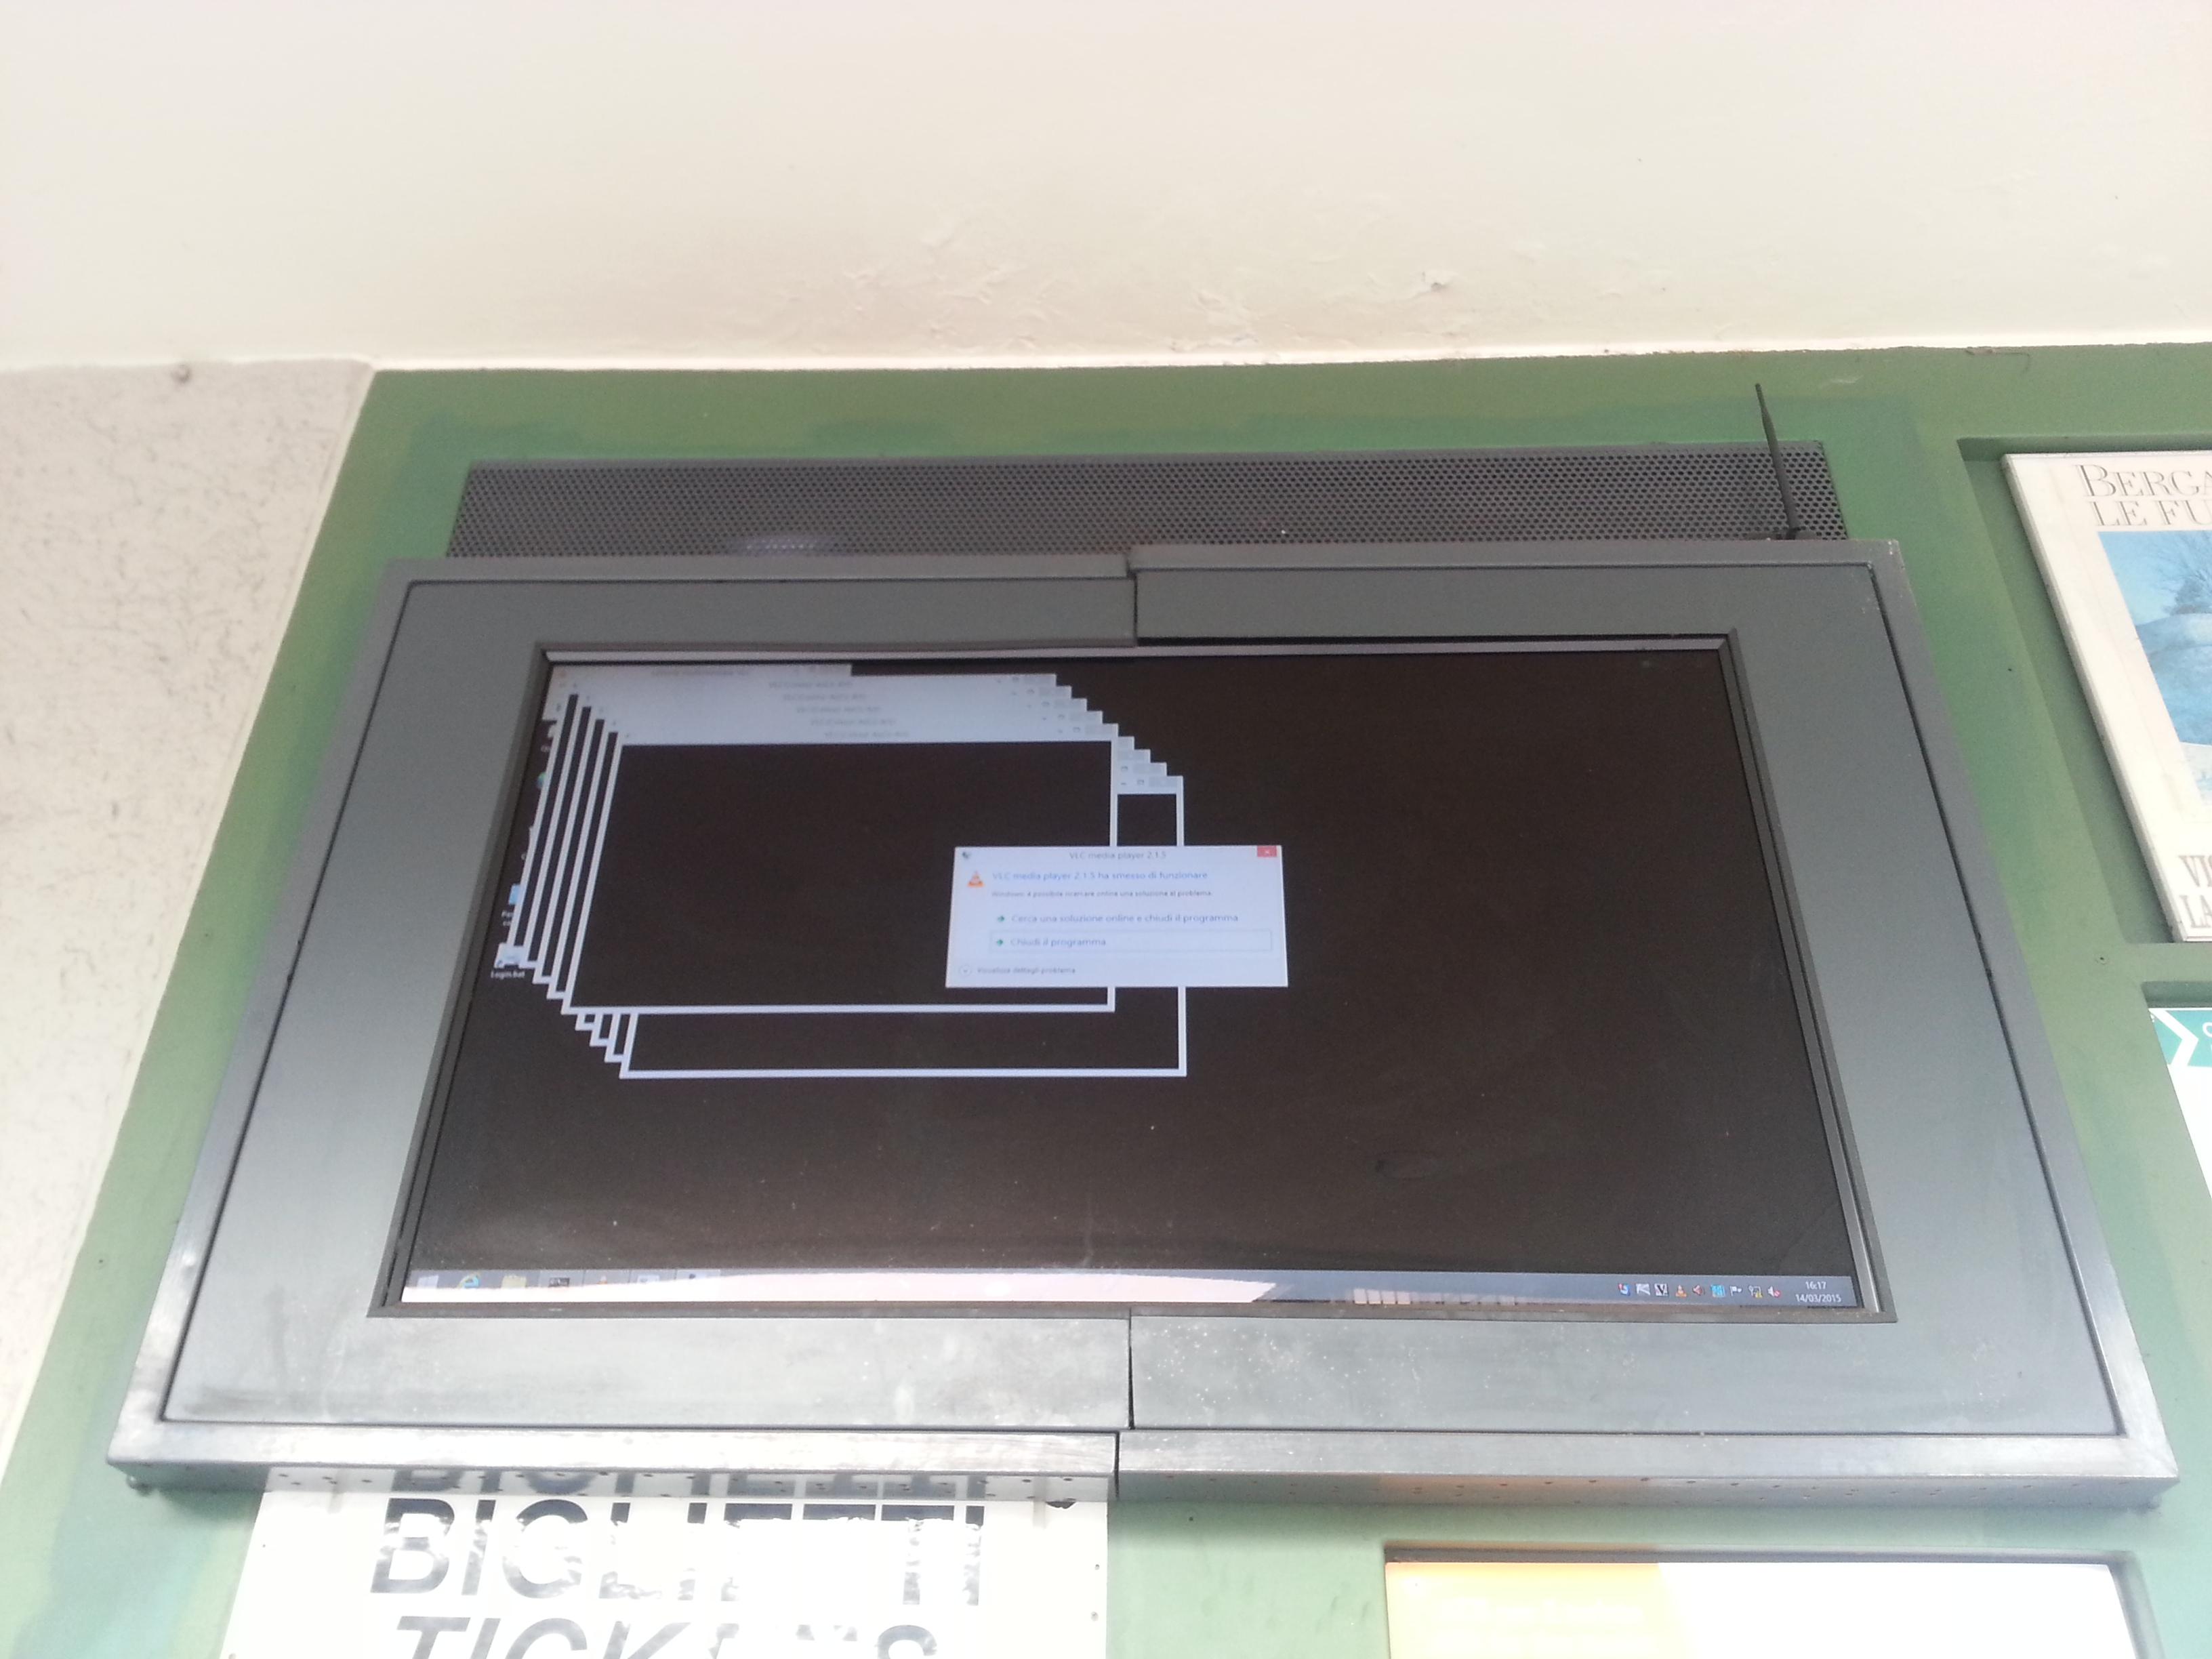 VLC on Windows. Bergamo, March 2015.